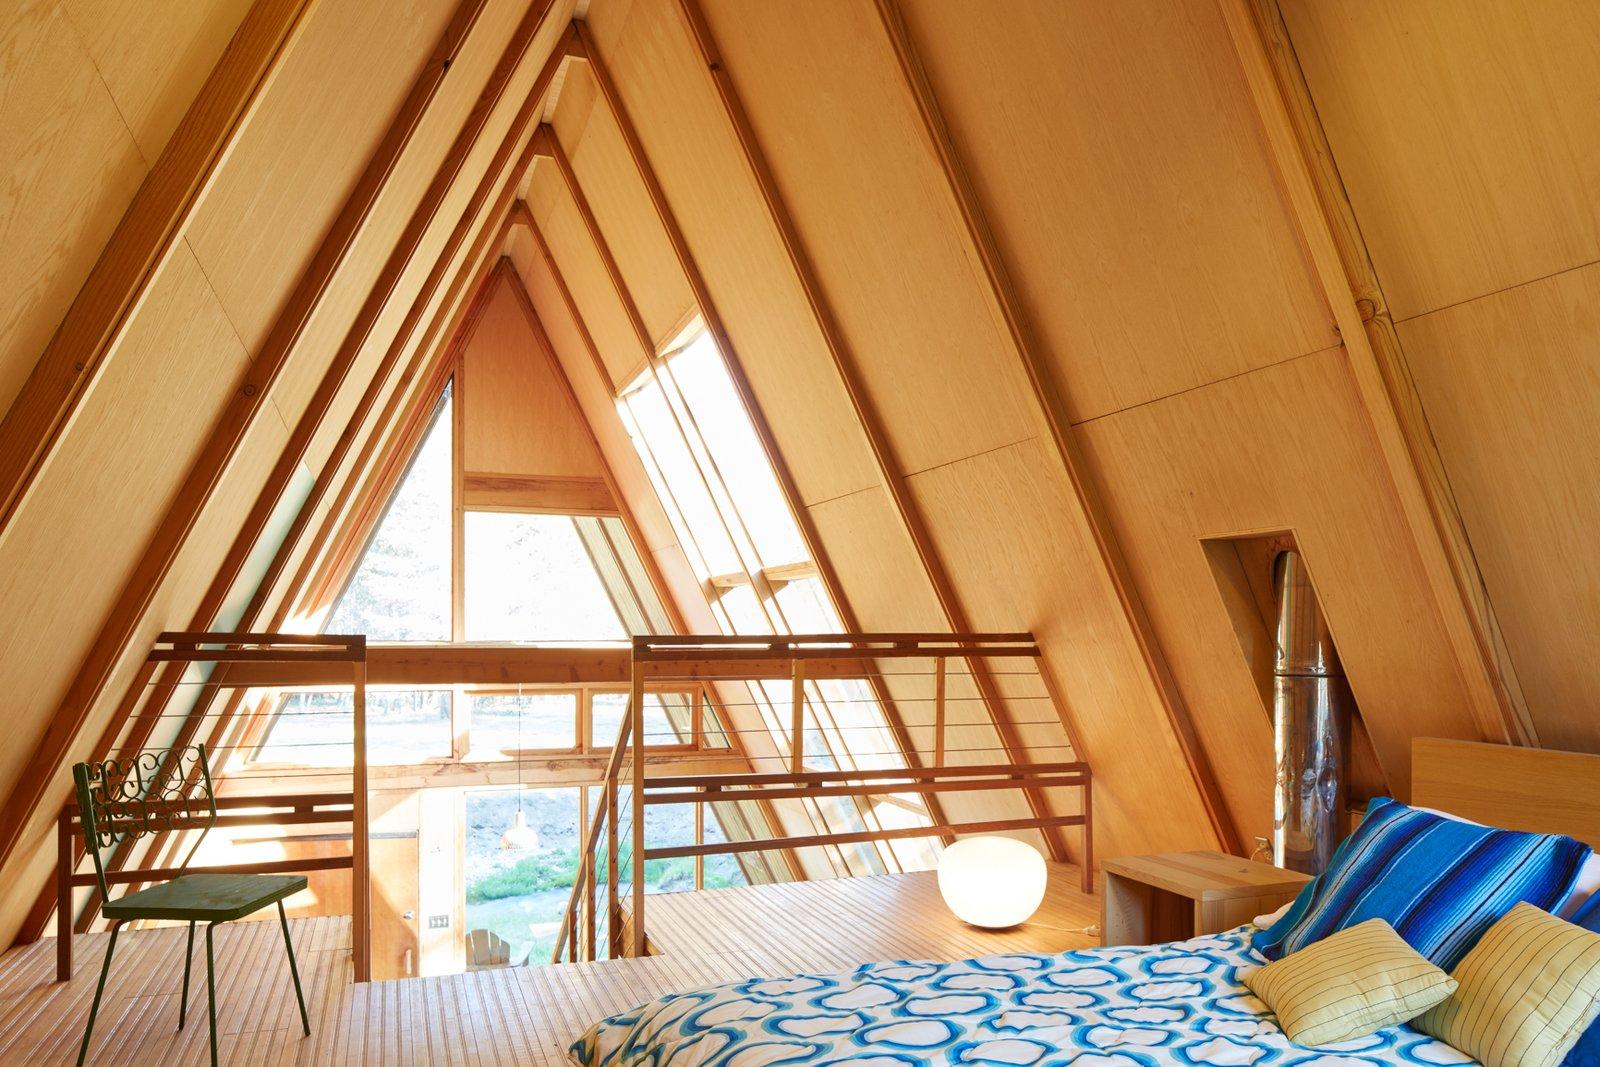 Far Meadow Veronique Lievre Heniz Legle bedroom